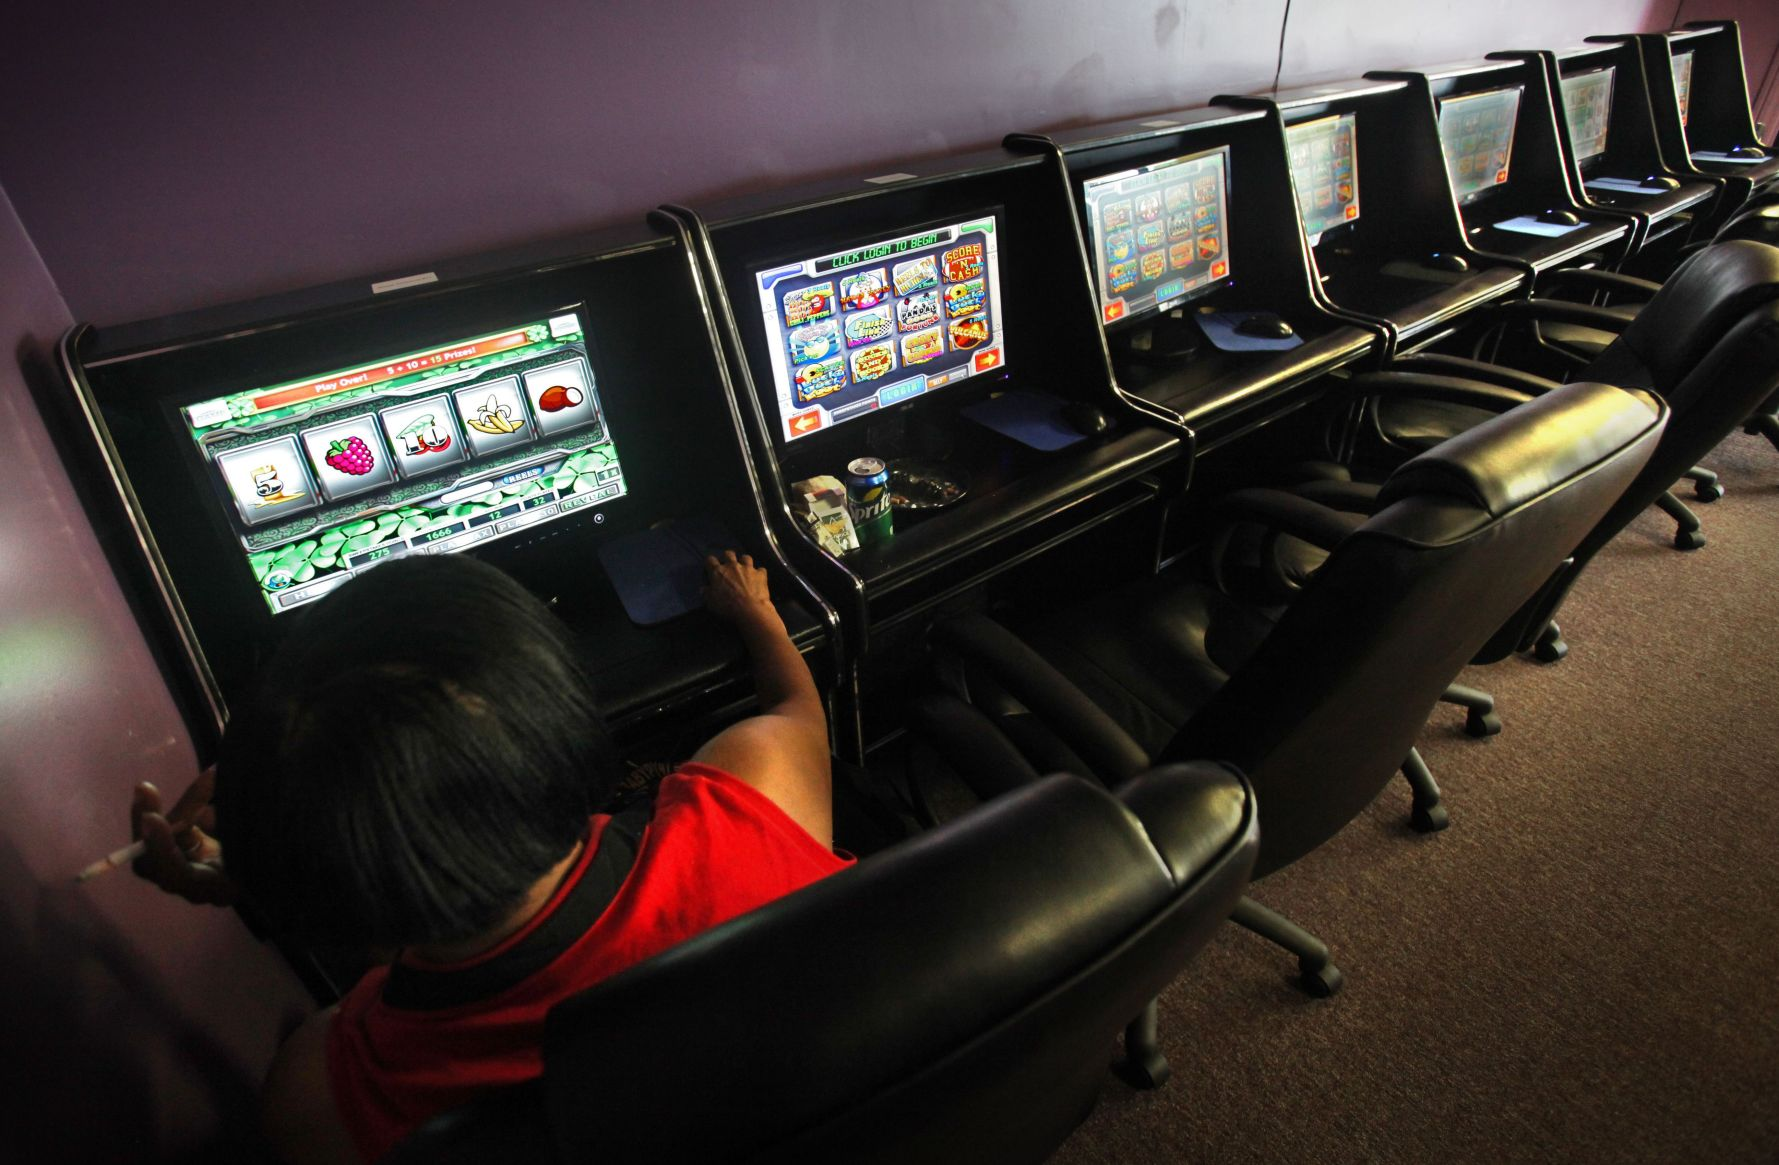 Legal gambling machines in sc casino download game no practice